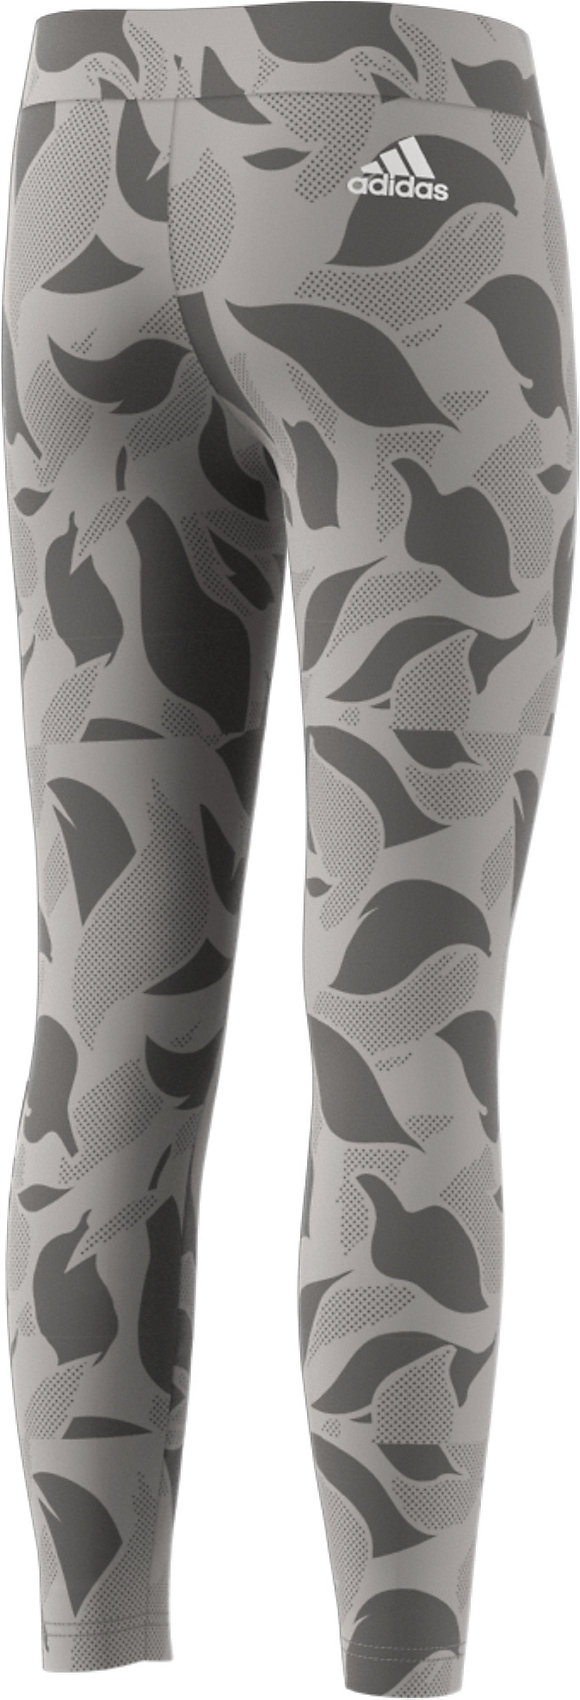 adidas performance leggings grau mädchen